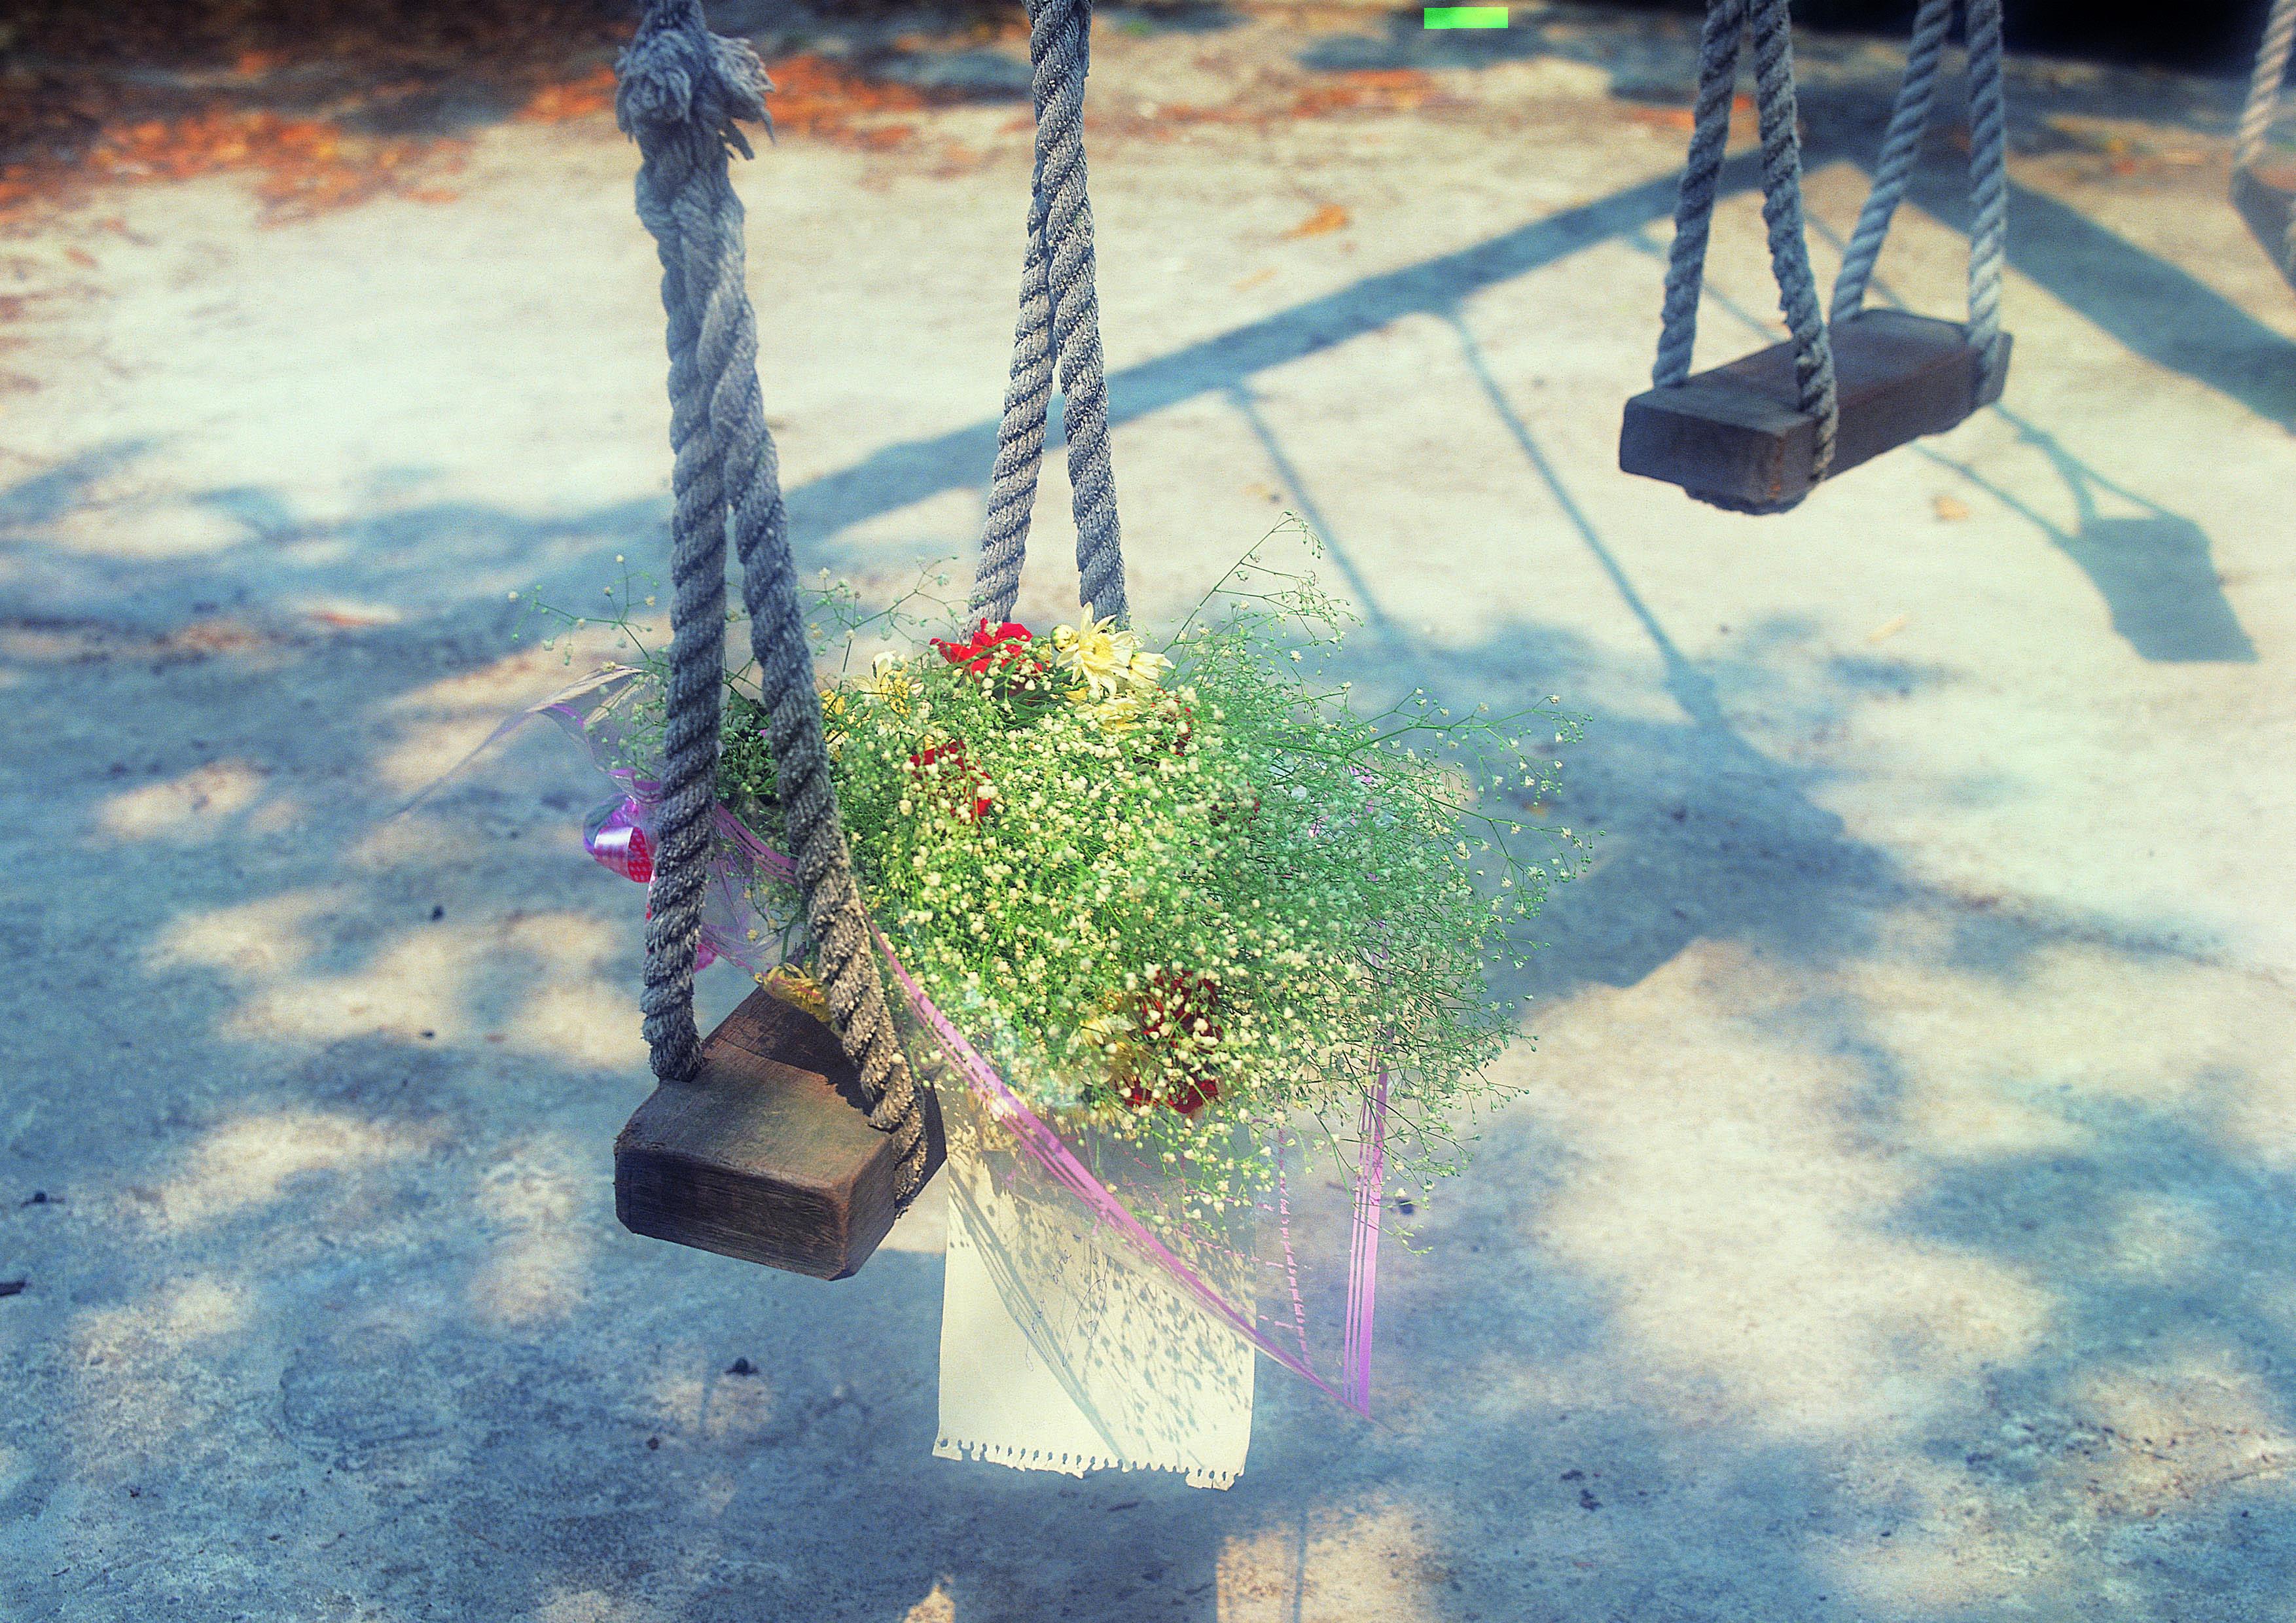 Flower on swing set photo